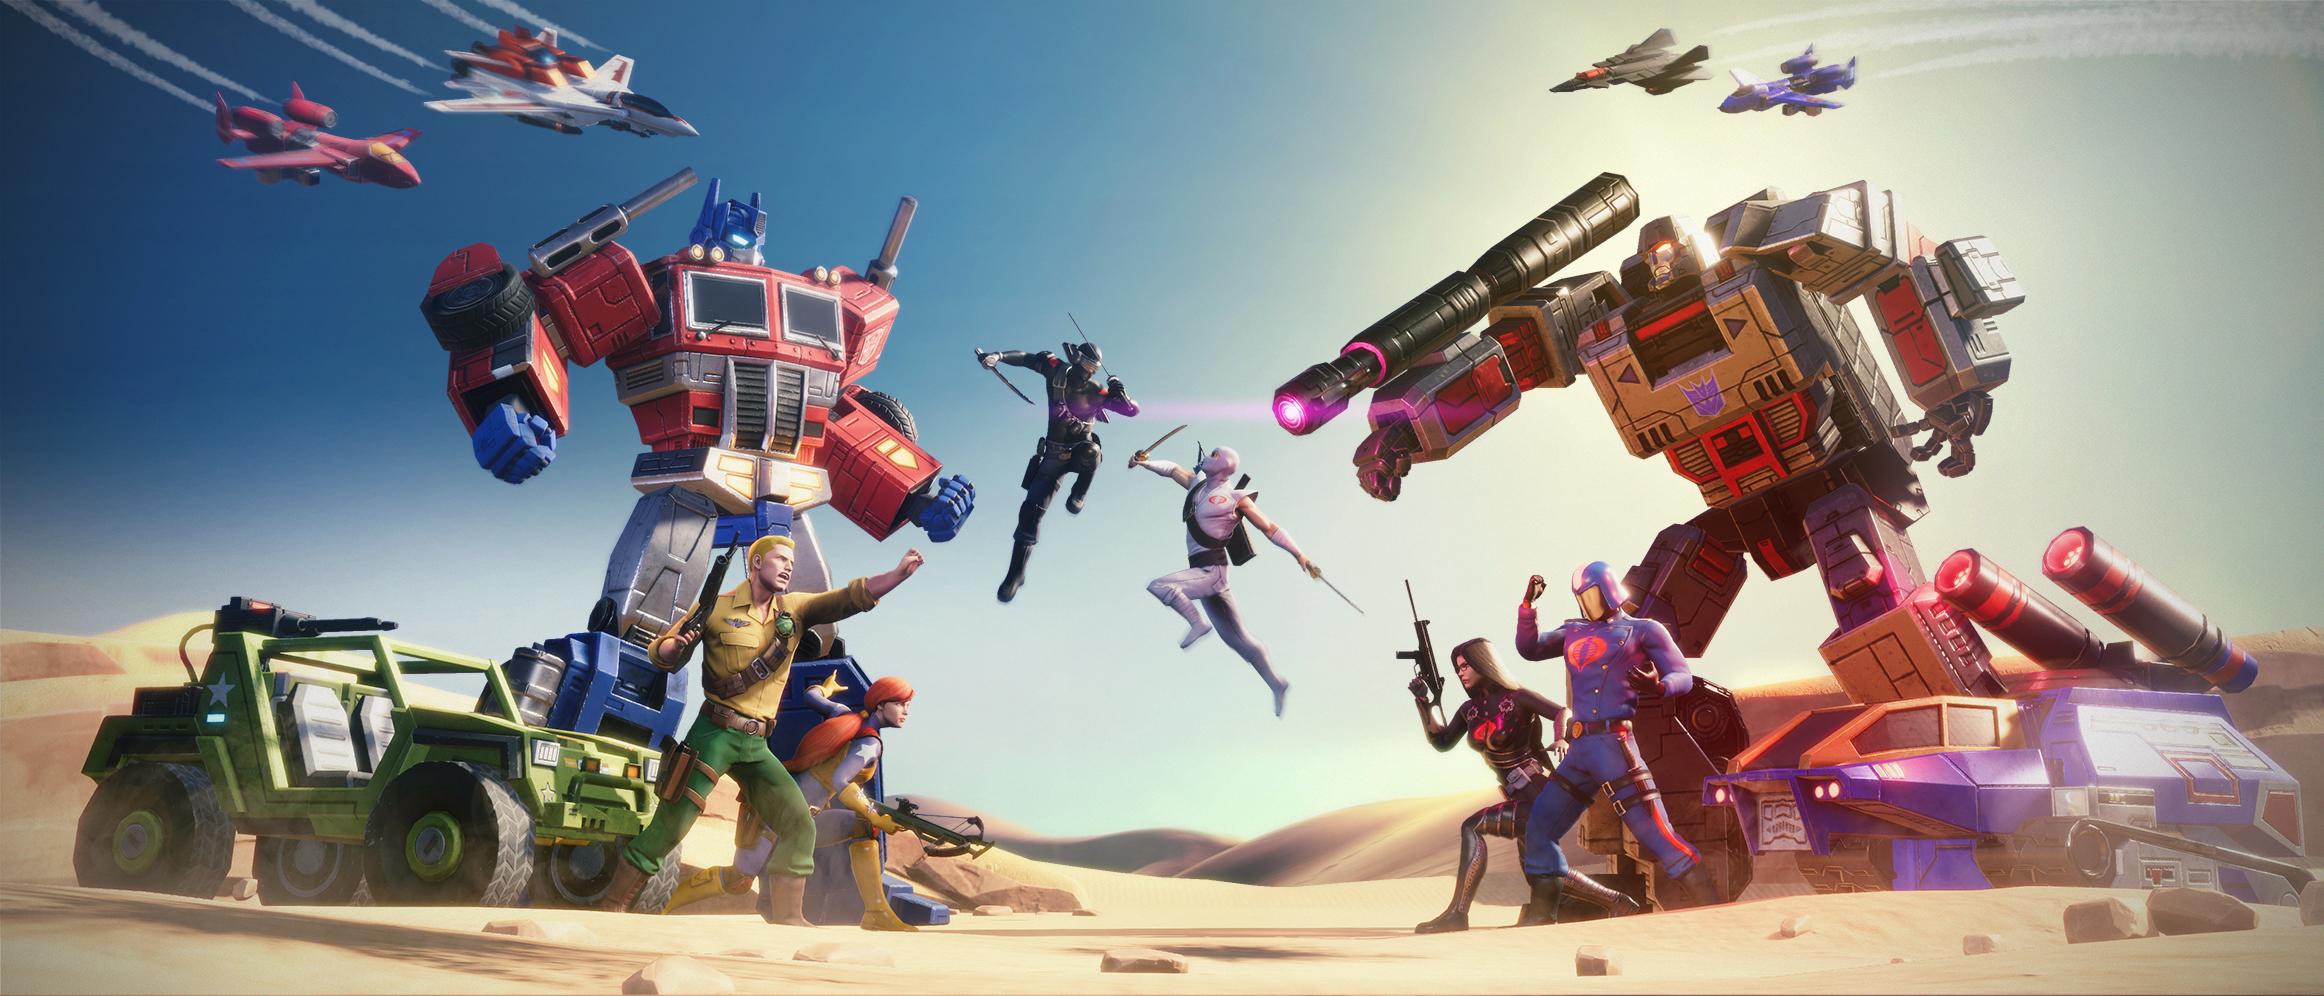 GIJoe vs Transformers in Transformers Earth Wars Game 2324x996